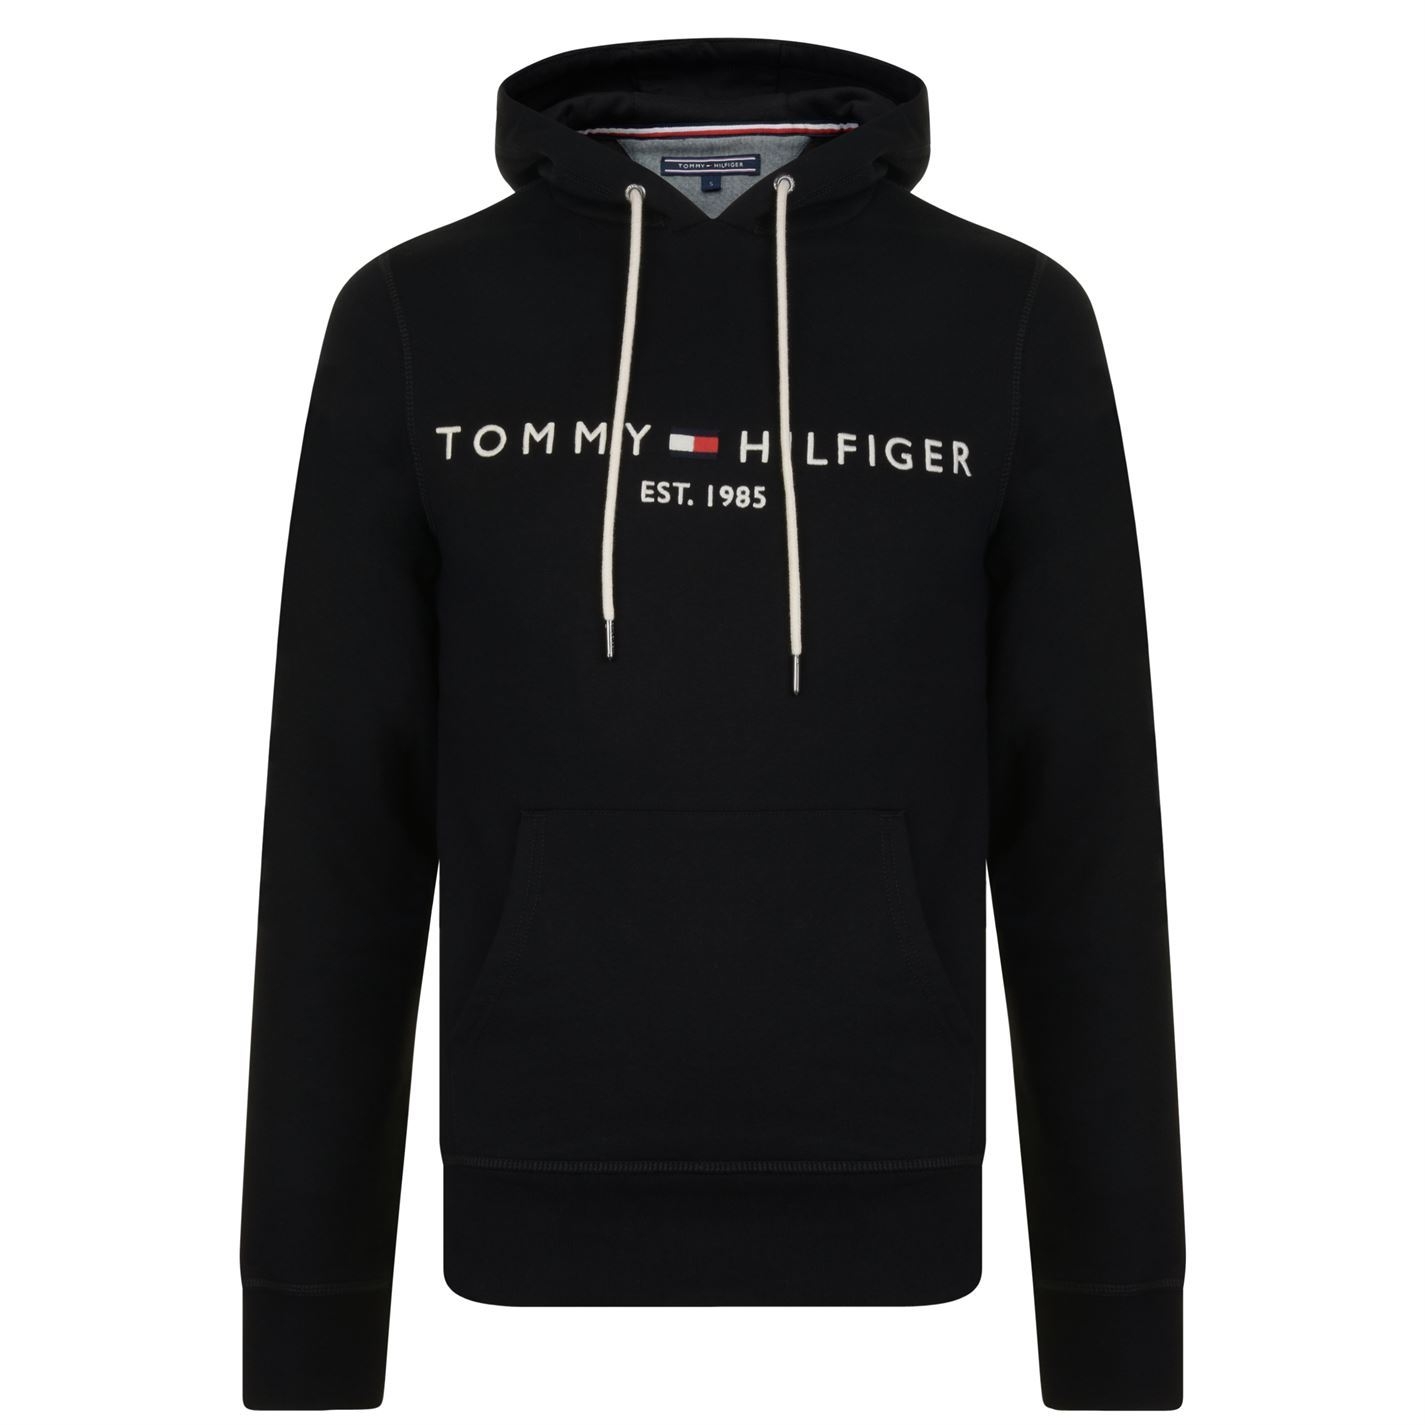 Mens-TOMMY-HILFIGER-Logo-Hooded-Sweatshirt-OTH-Hoodie-New